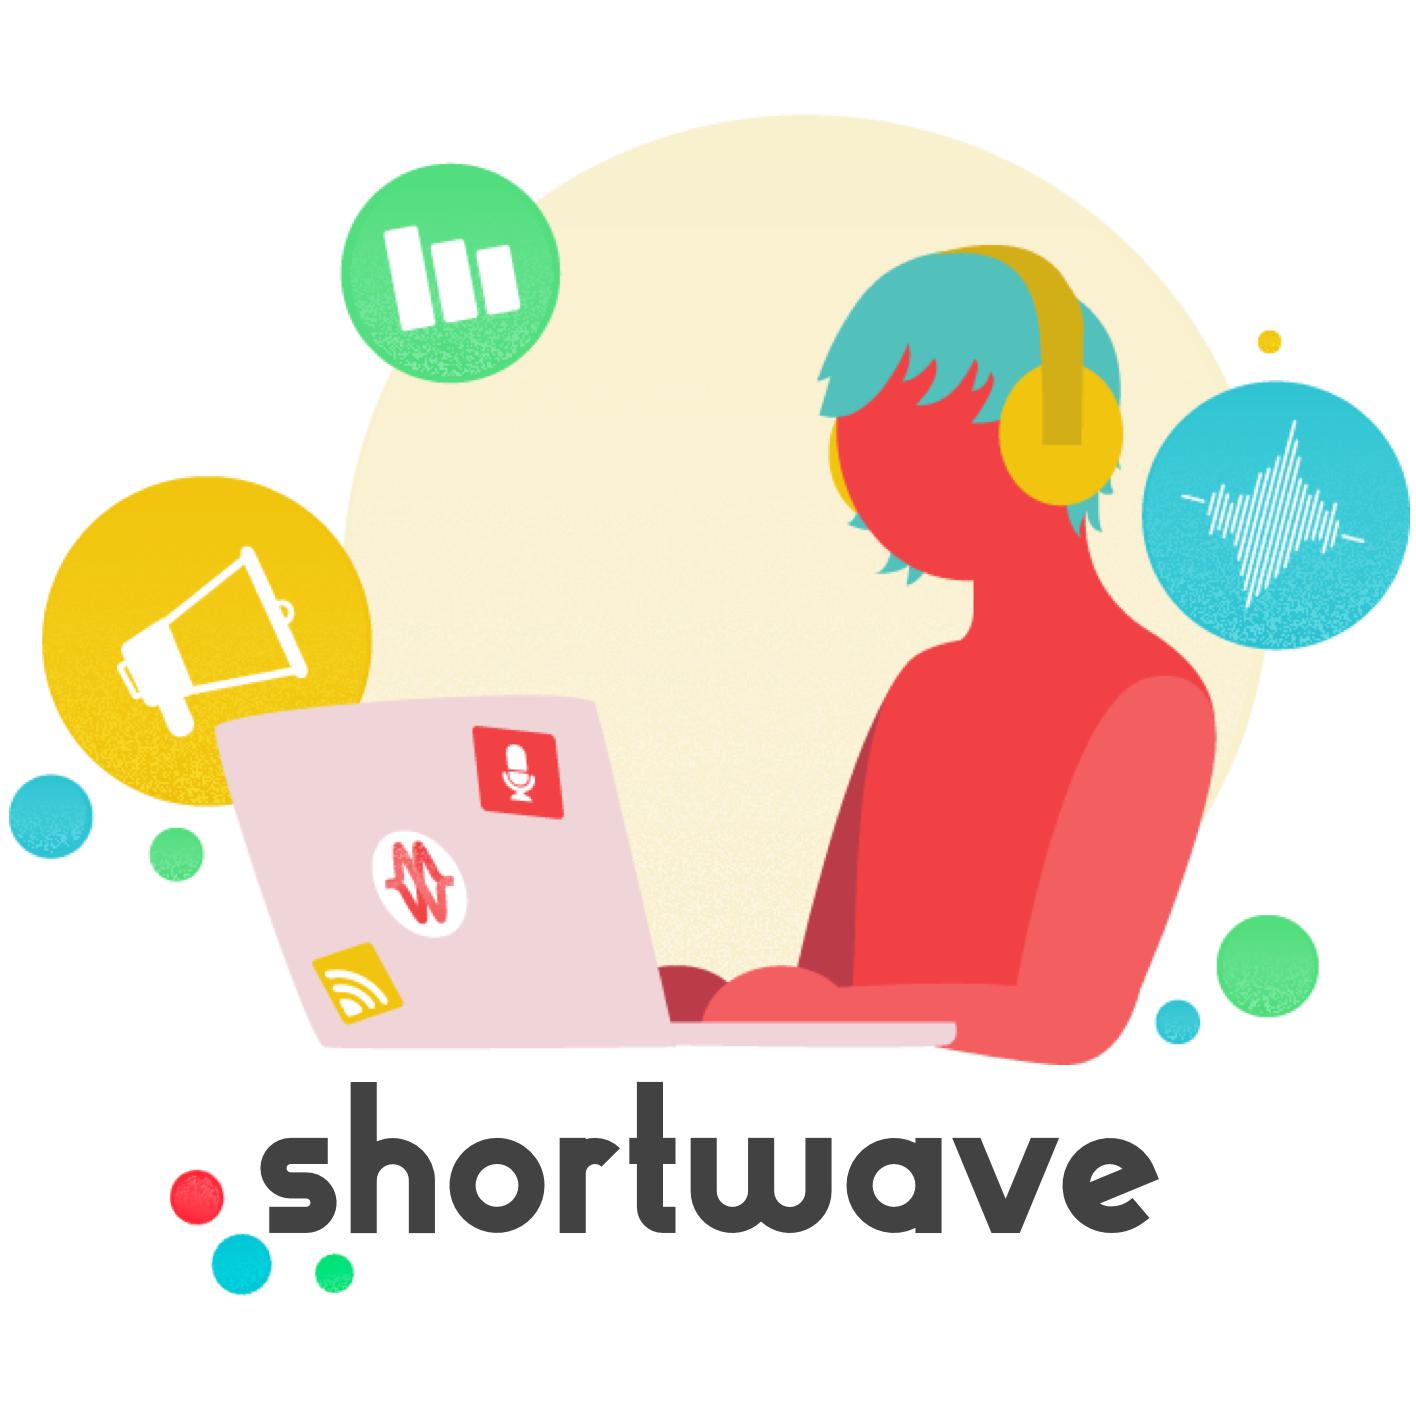 shortwave_podcon_2019_web_icon_3x.png